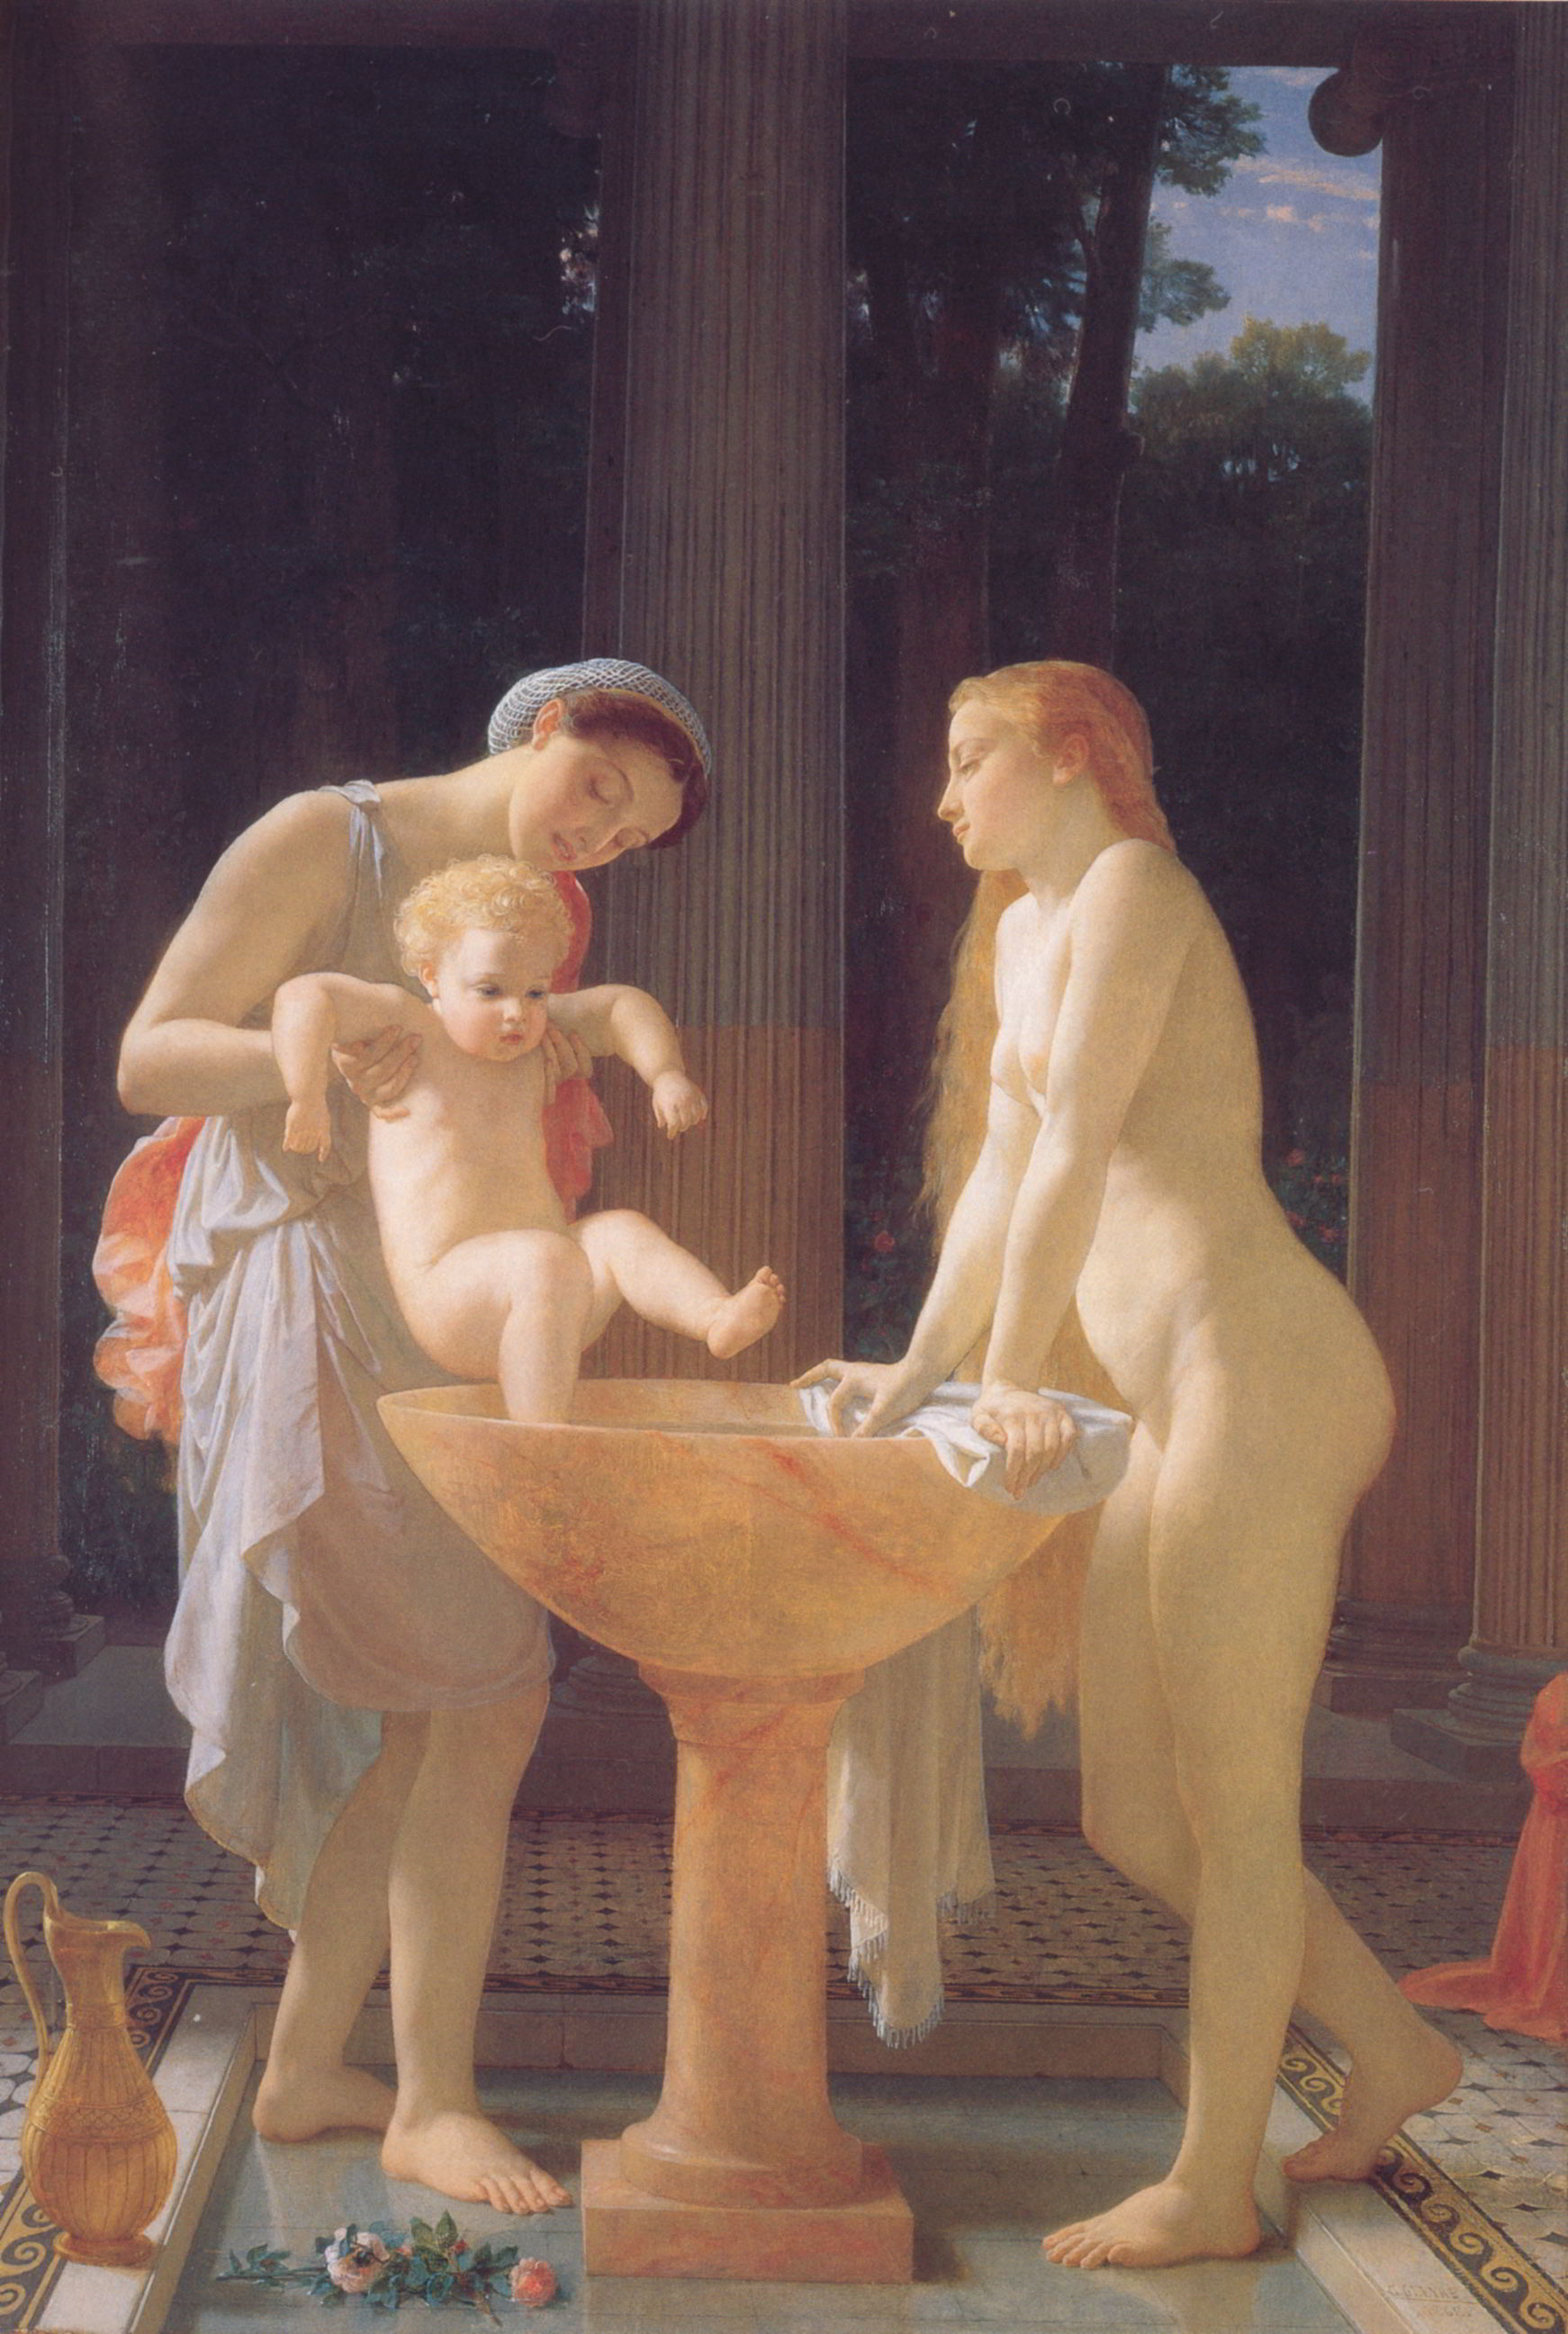 картина Купание младенца  ( интерьер купели ) :: Чарльз Глир - Картины ню, эротика в шедеврах живописи фото